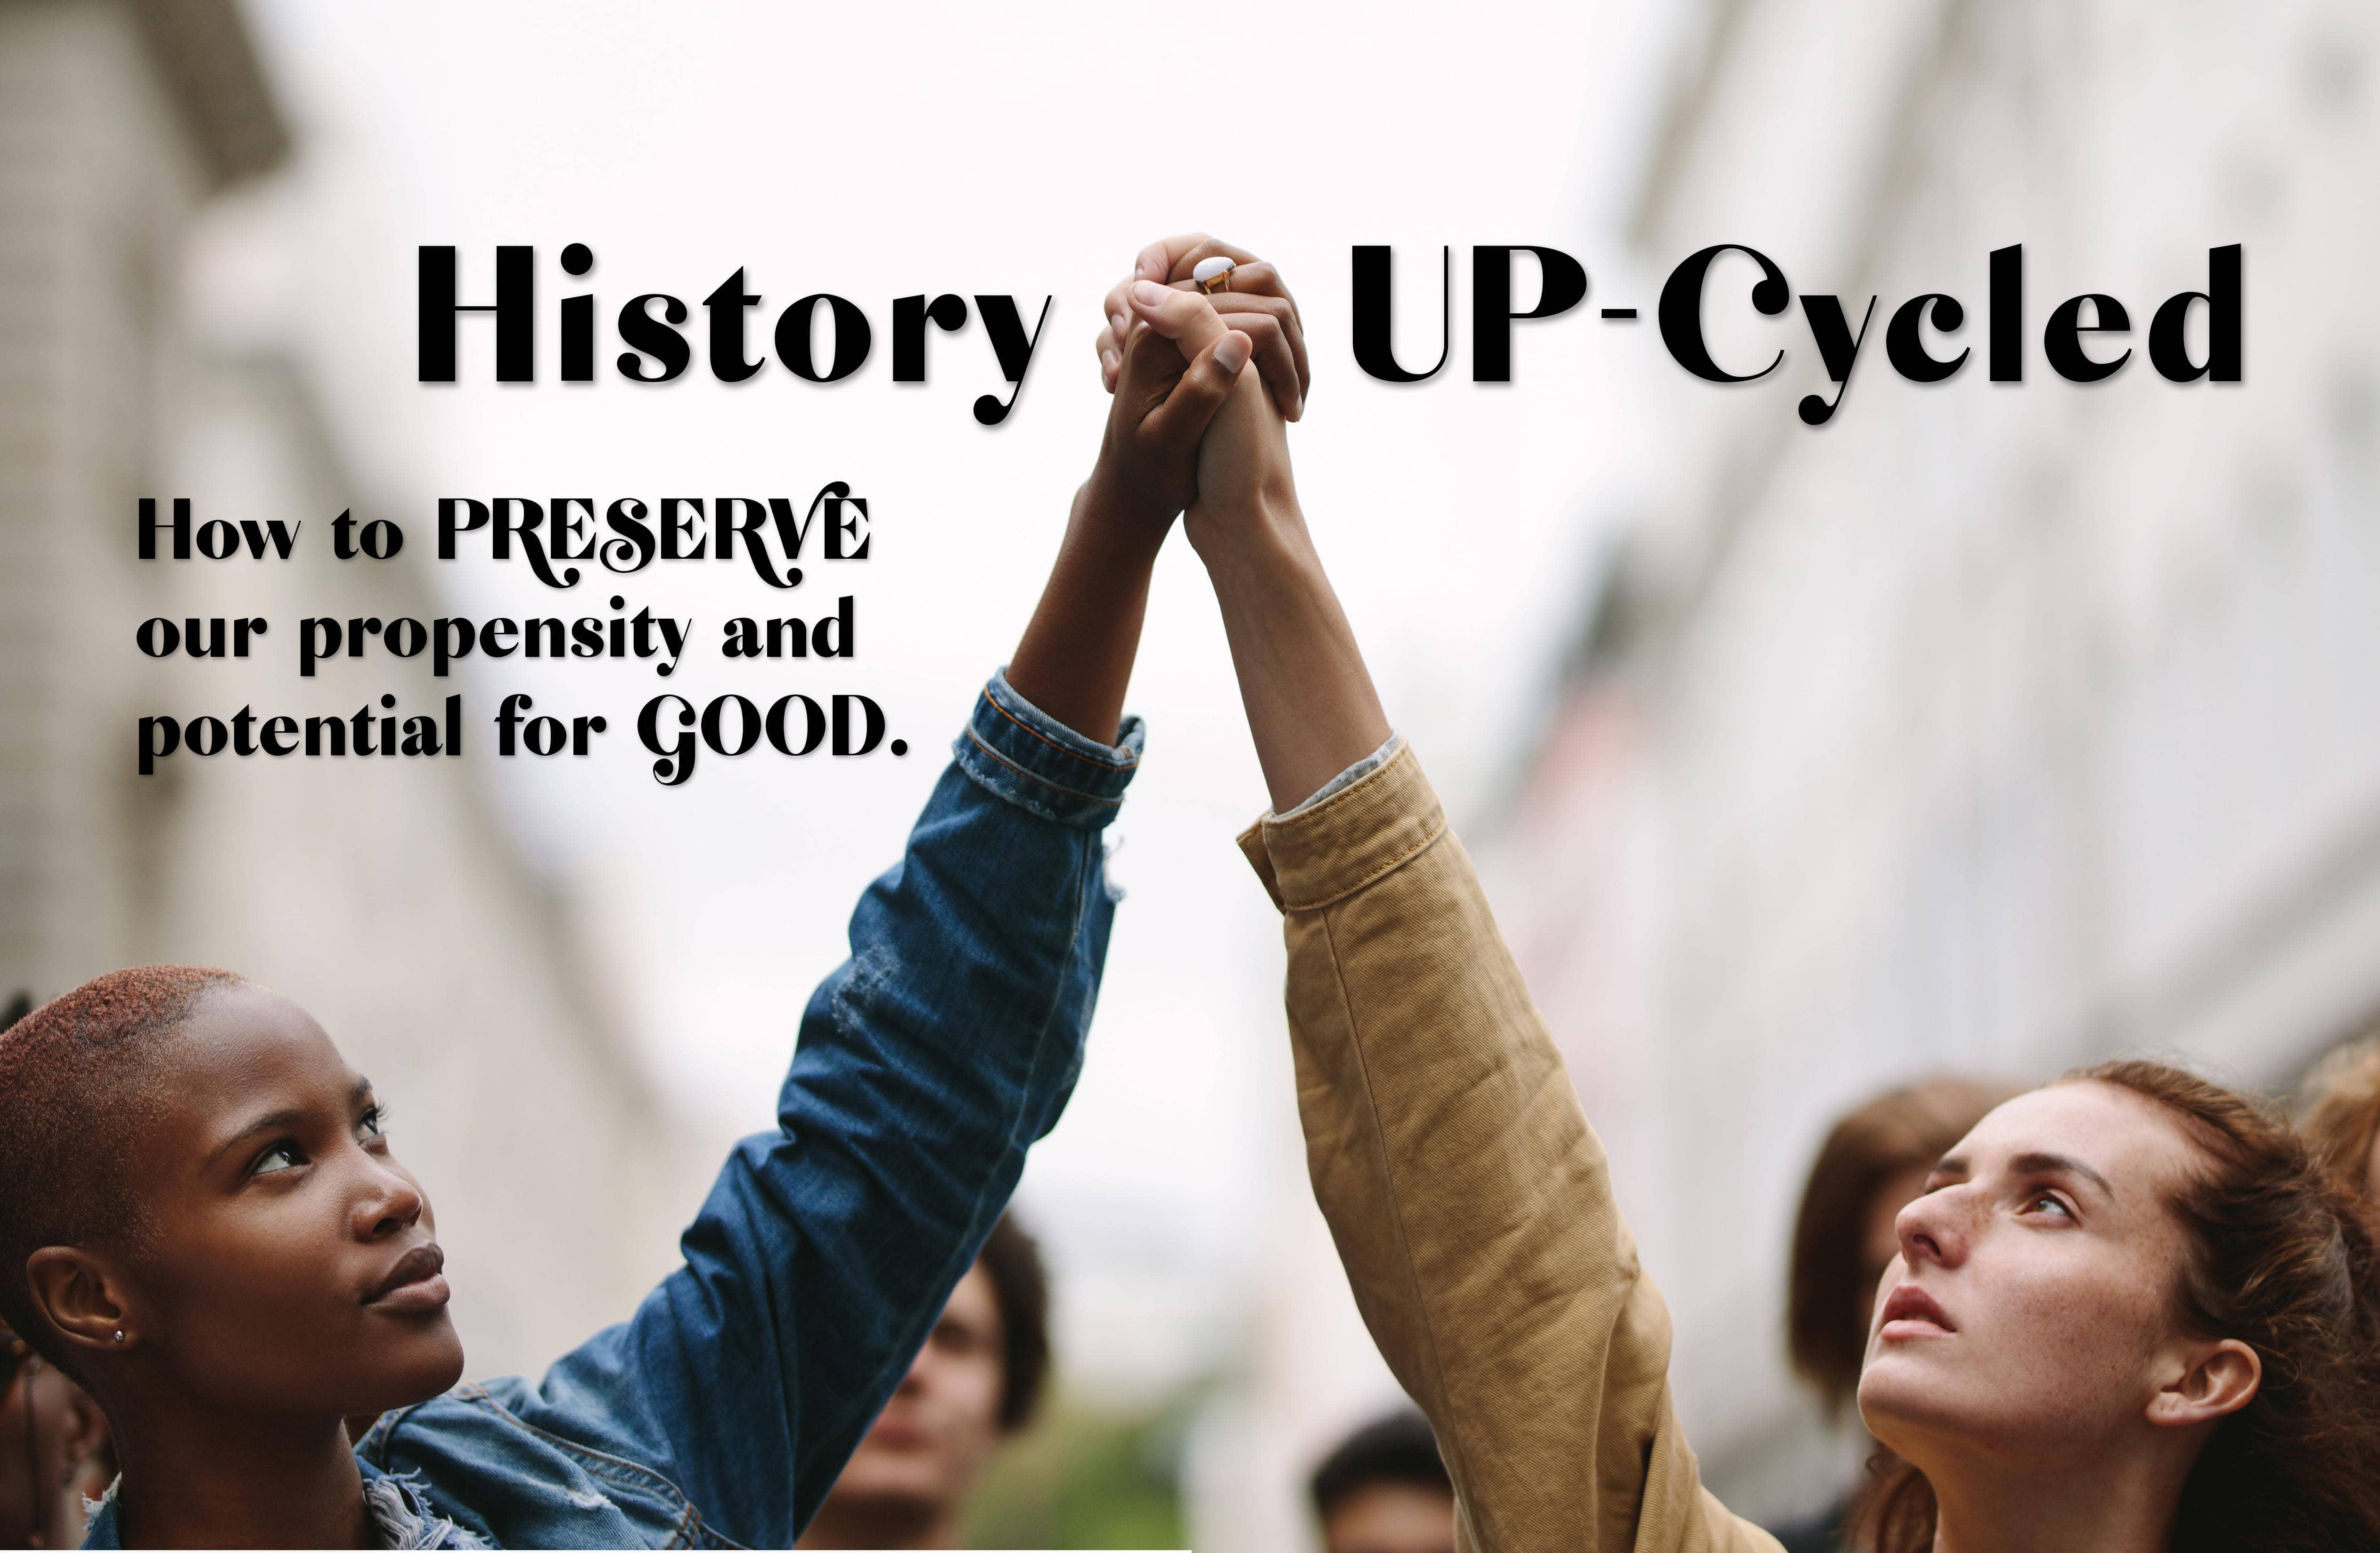 History UP-Cycled